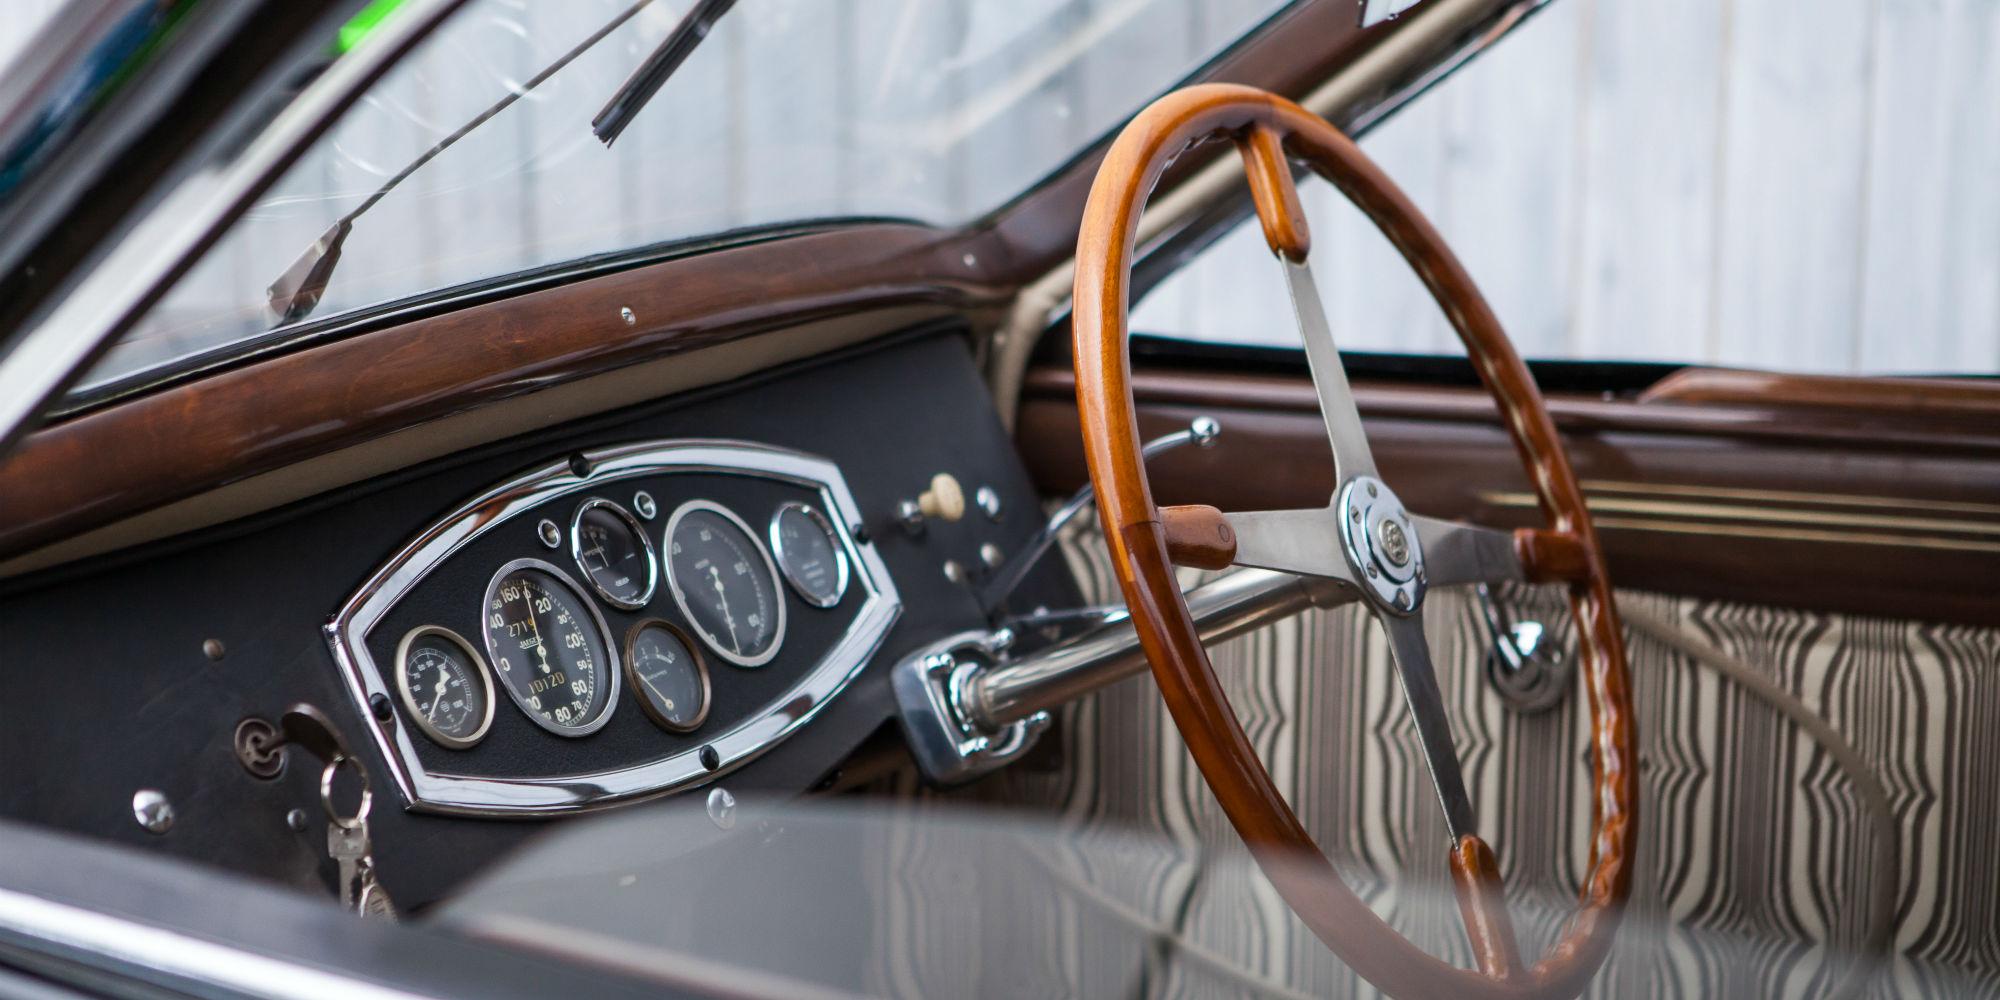 1928 Bugatti Type 44 Profilée Aérodynamique by Gangloff